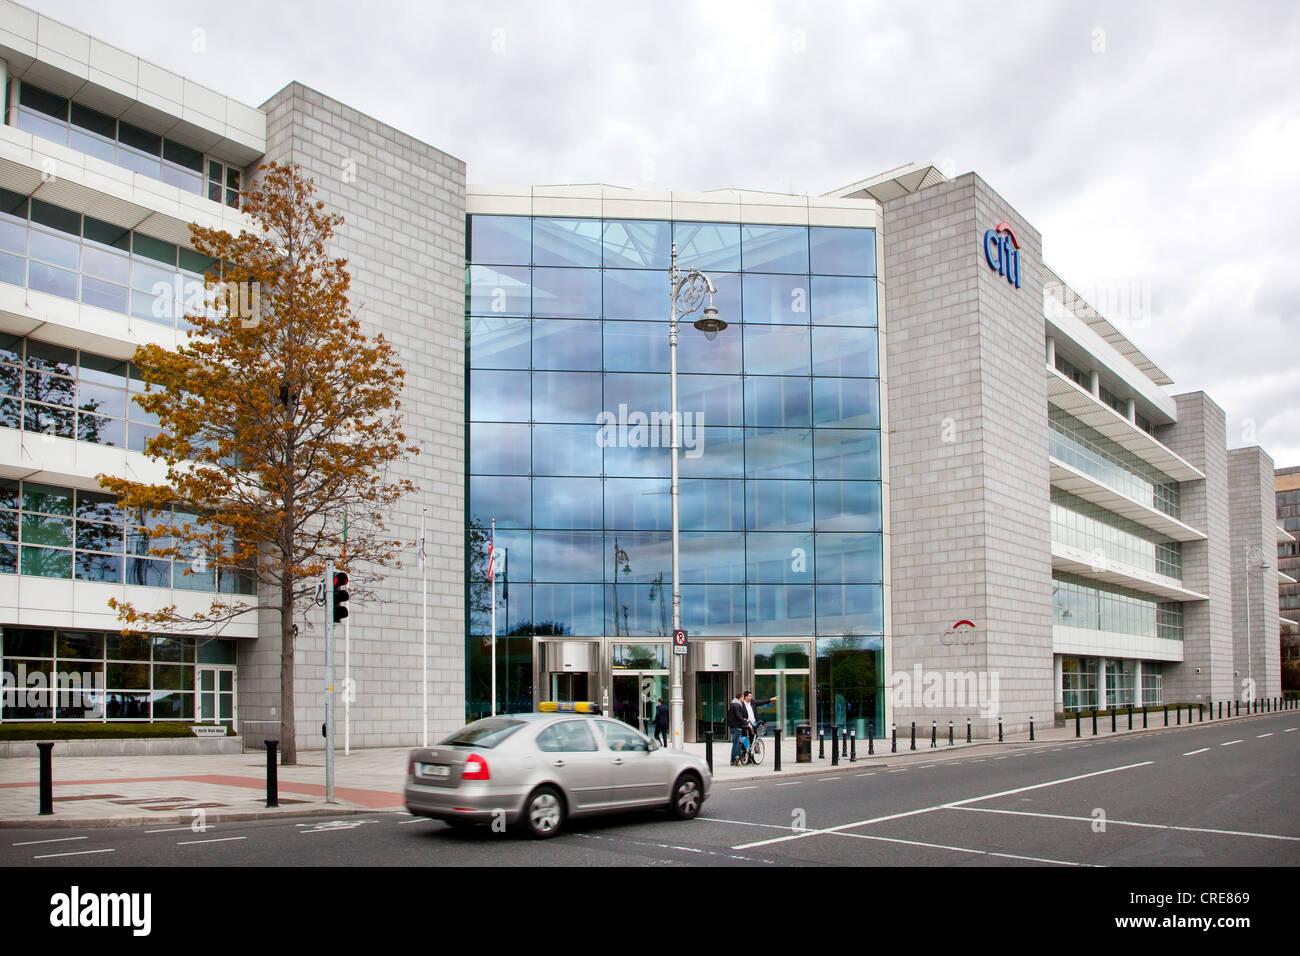 Headquarters of the Citi Bank, Dublin, Ireland, Europe - Stock Image